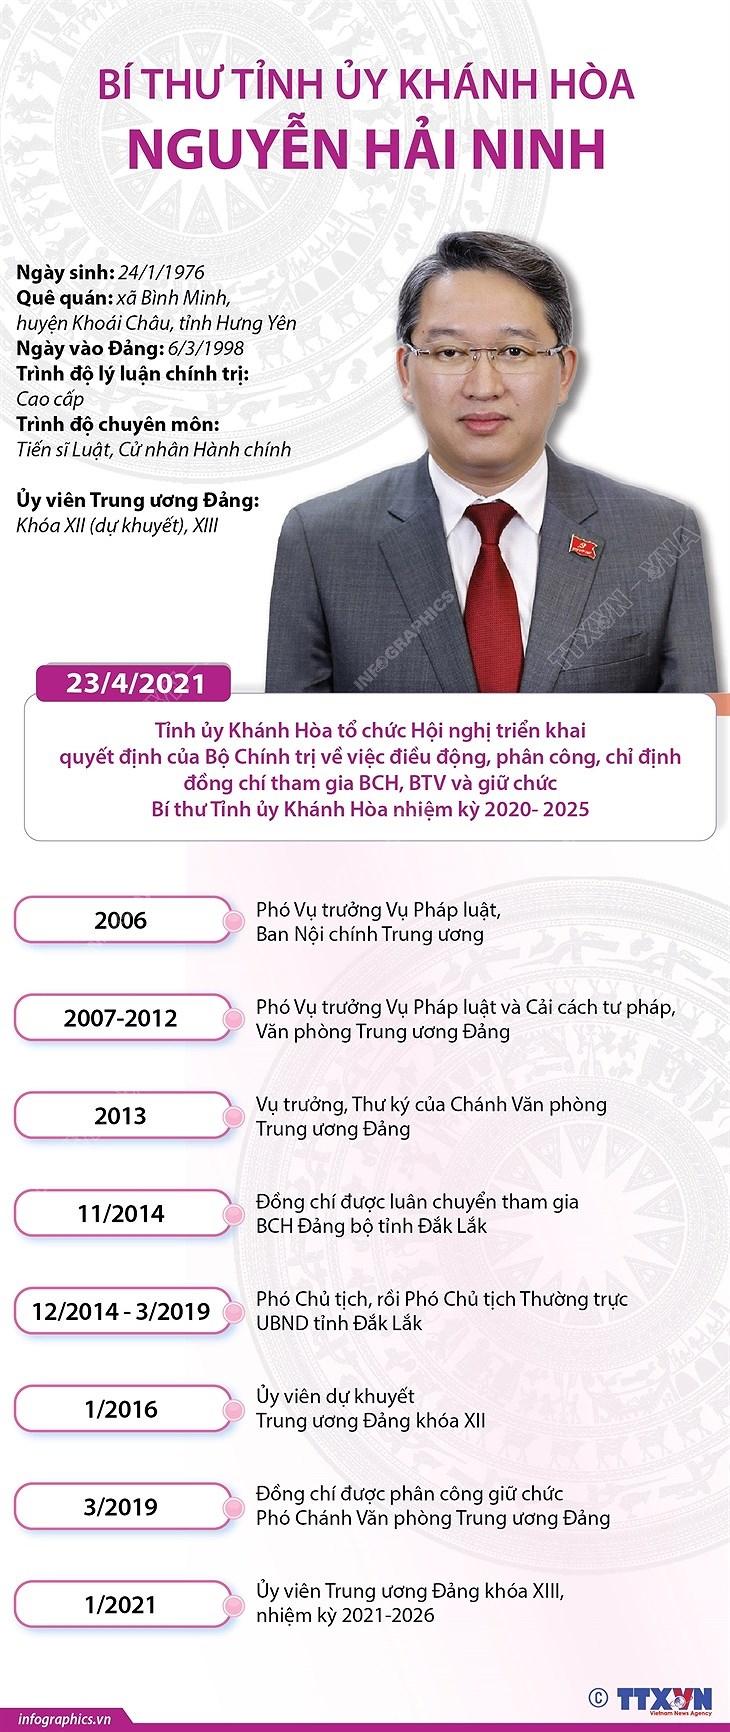 [Infographics] Chan dung Bi thu Tinh uy Khanh Hoa Nguyen Hai Ninh hinh anh 1